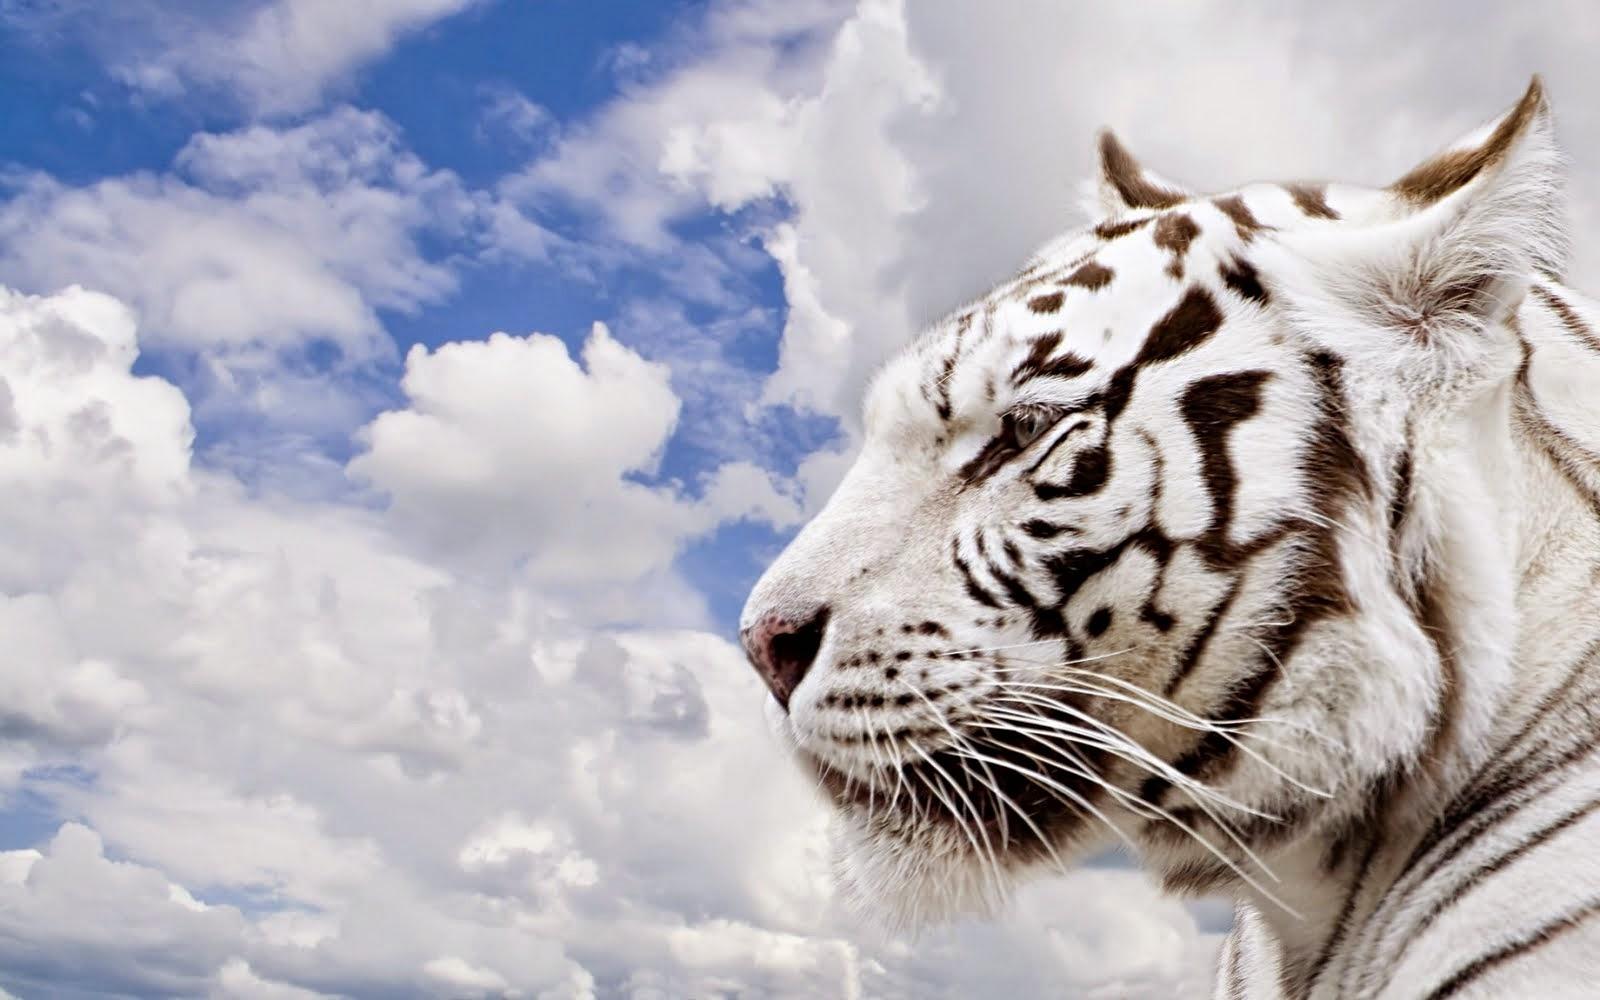 beautiful animals full hd wallpapers free download